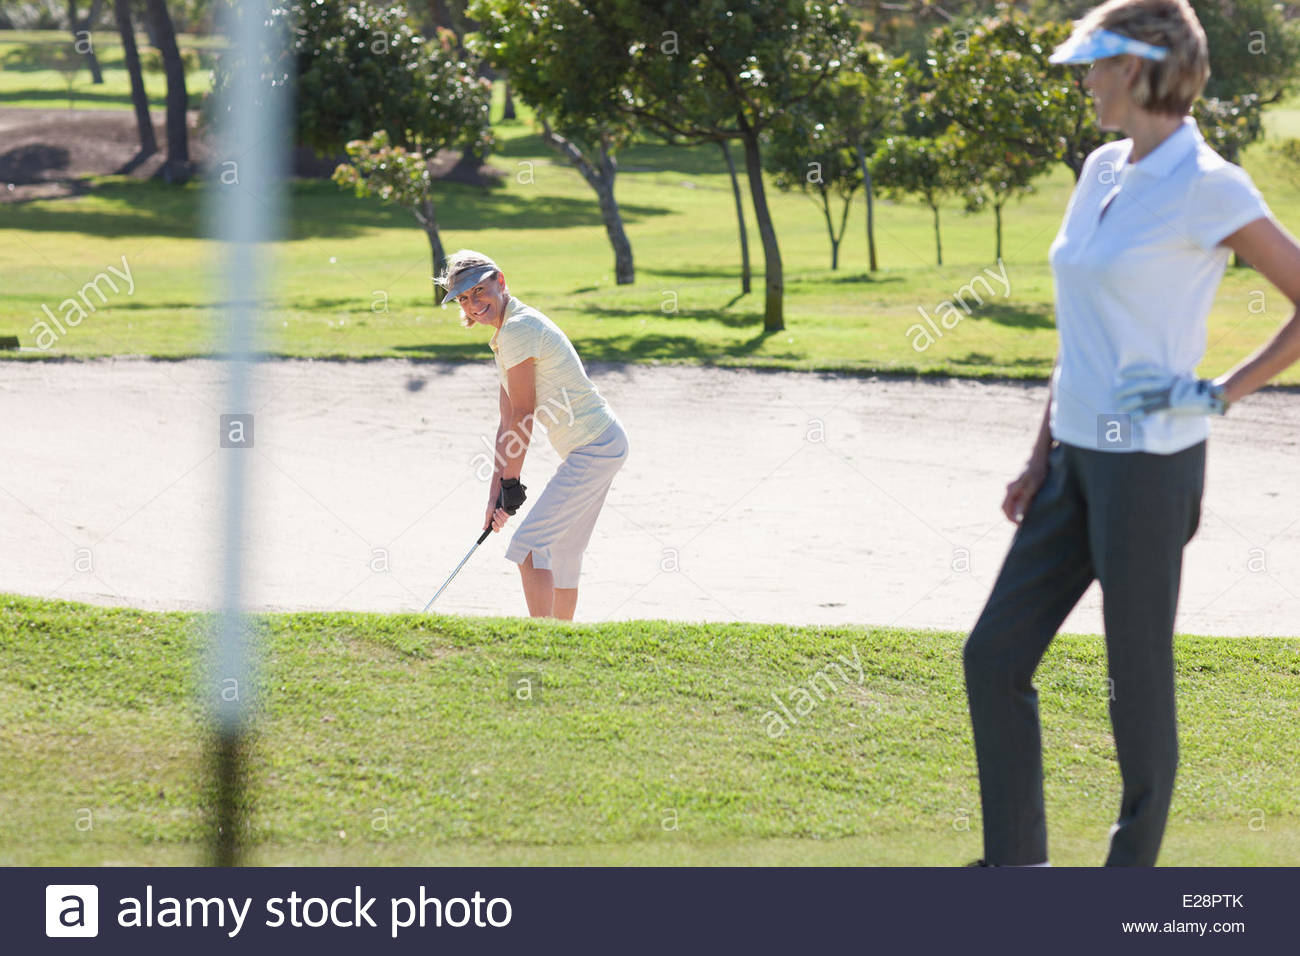 Women playing golf - Stock Image